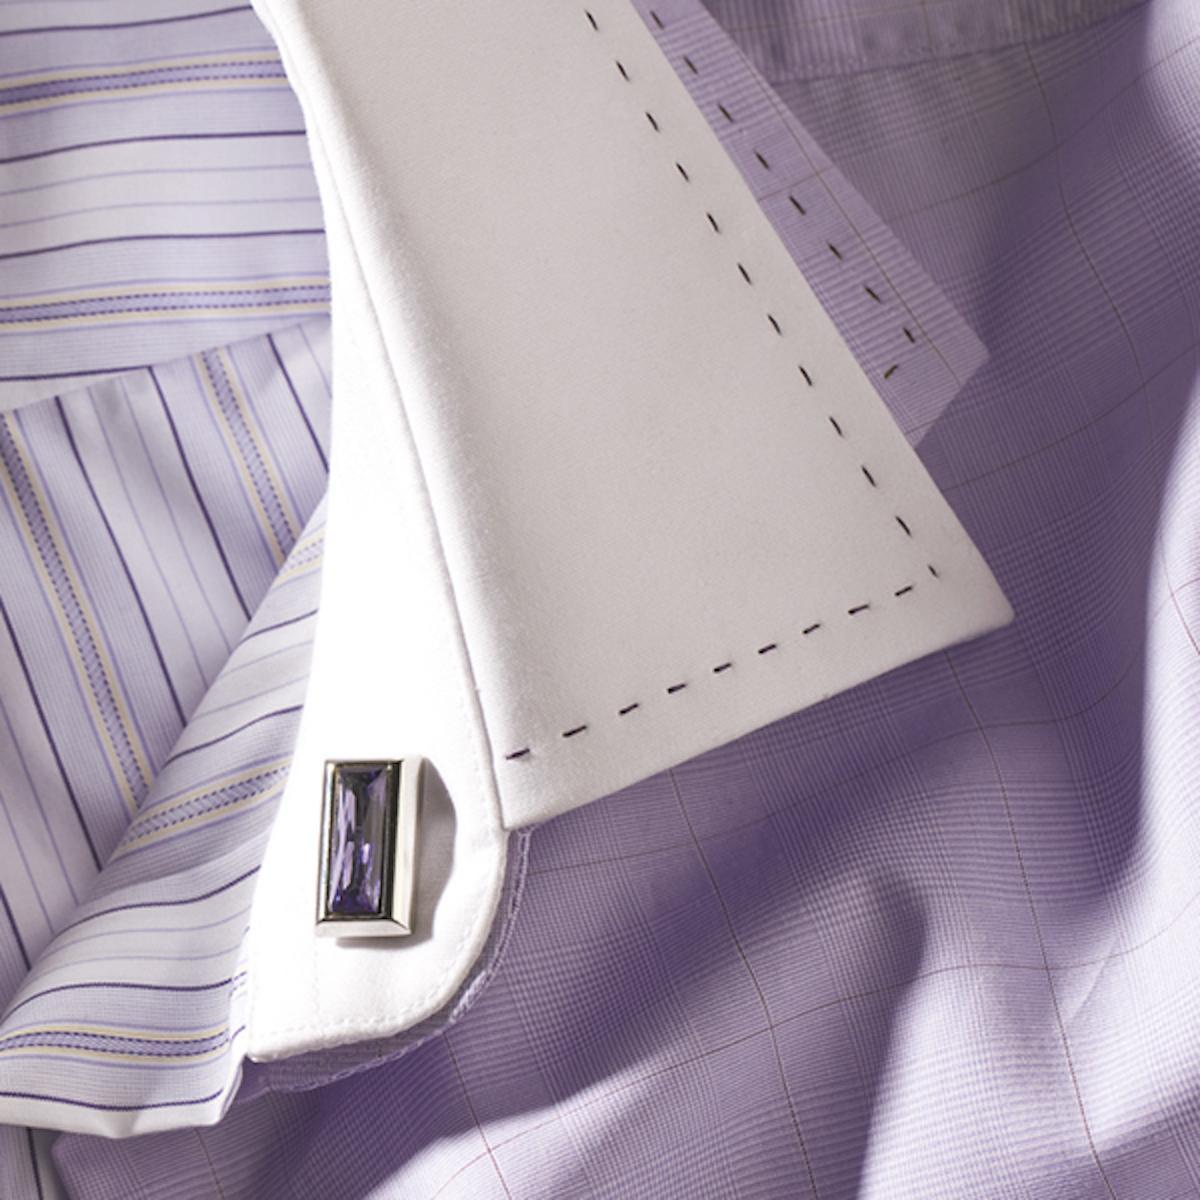 Combination of light blue shirt and violet cufflink